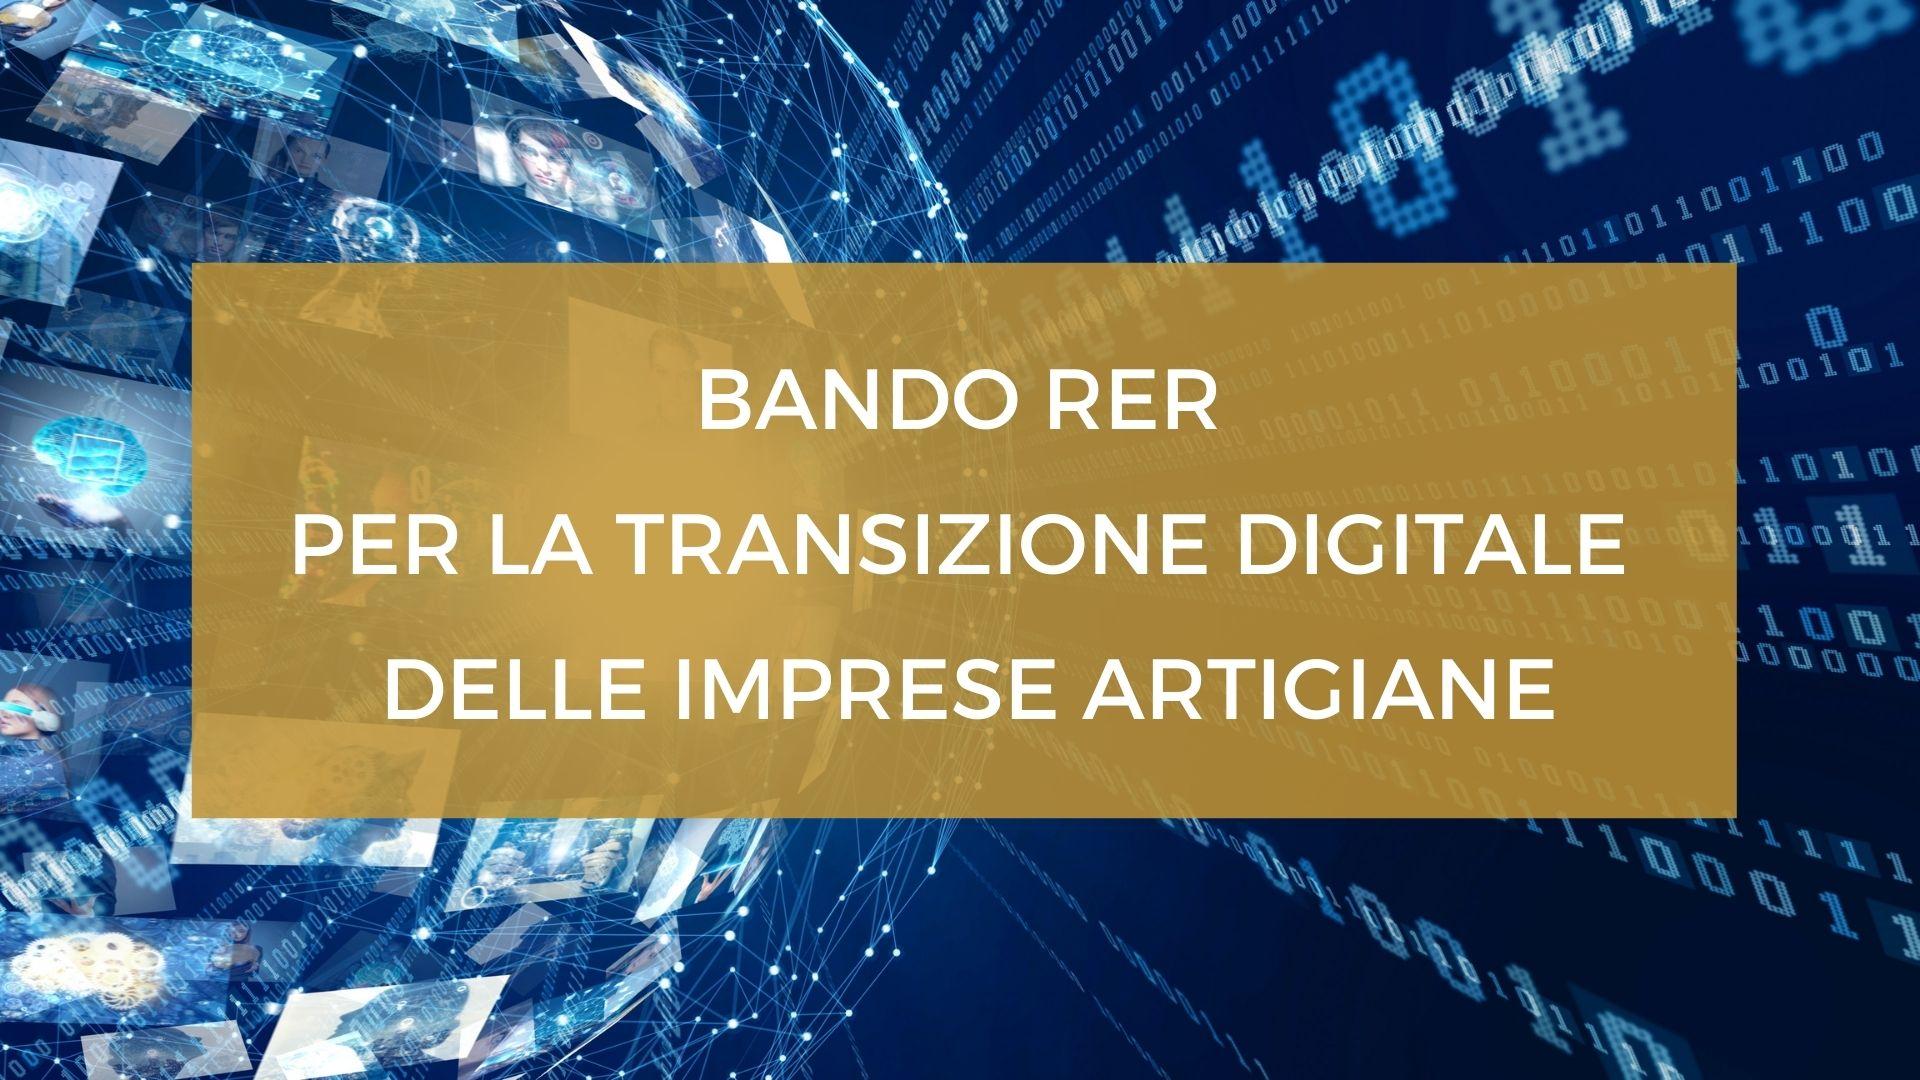 Transizione digitale imp. artigiane